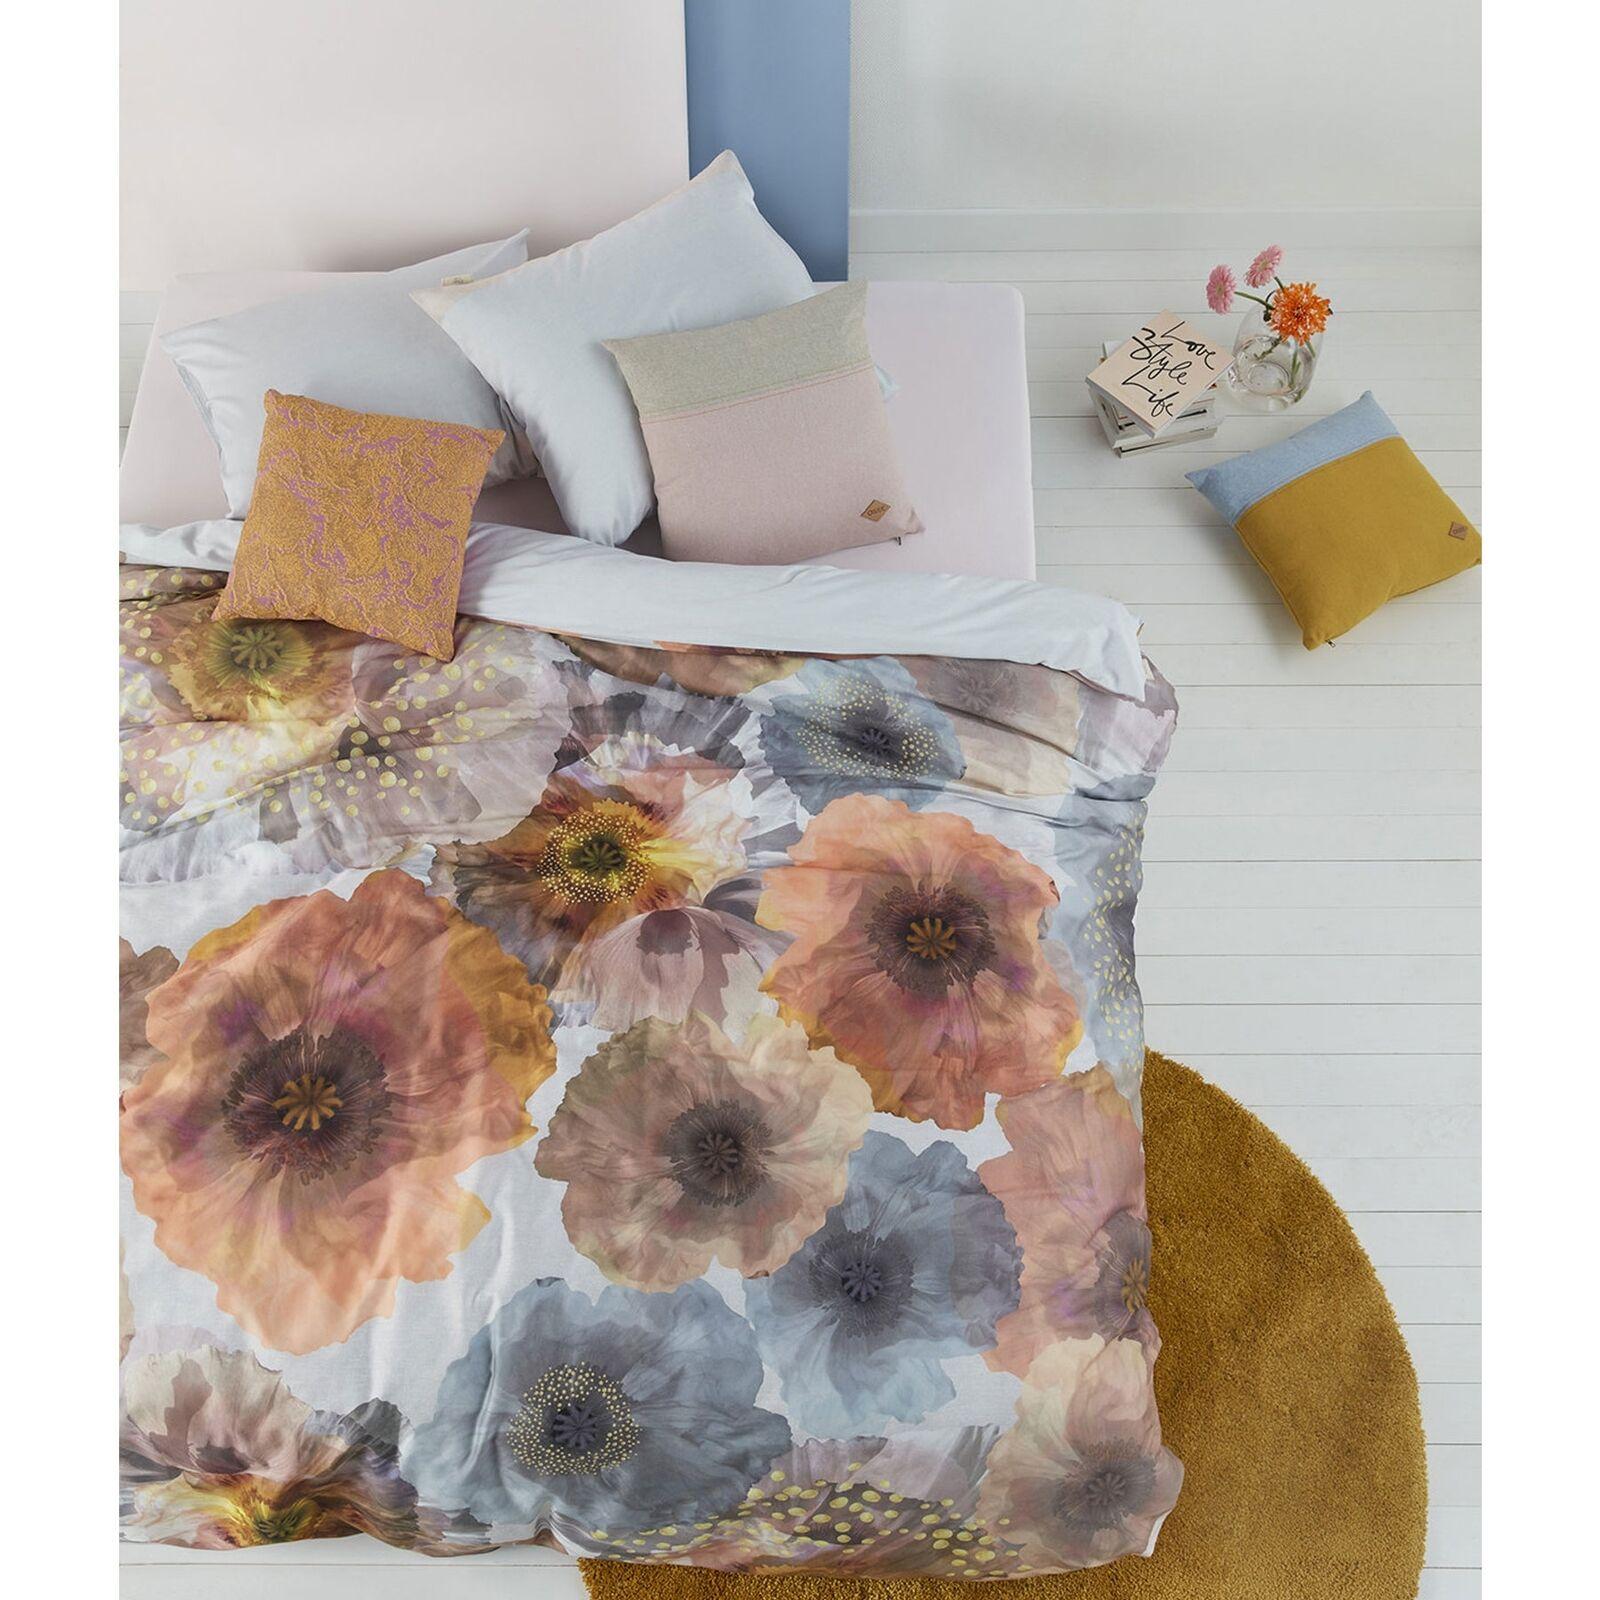 3 Pce MariGold Floral Multi Cotton Sateen Quilt Startseite Set by Oilily - ALL GrößeS